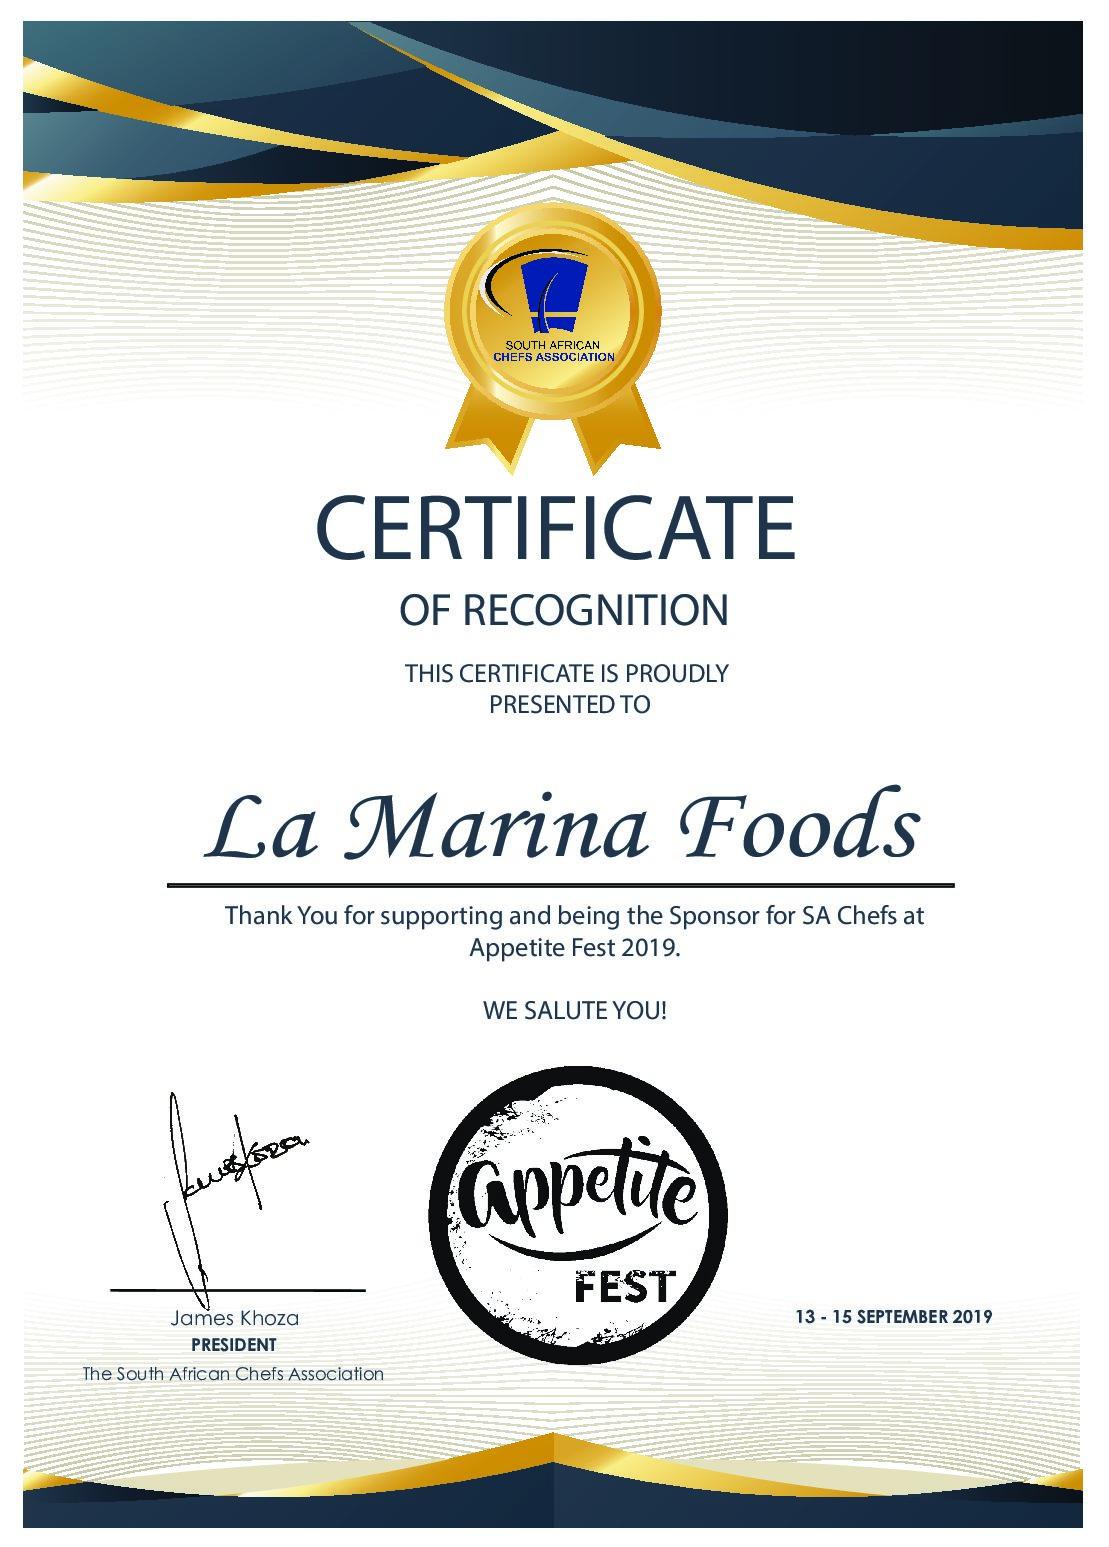 SA Chefs Appetite Fest